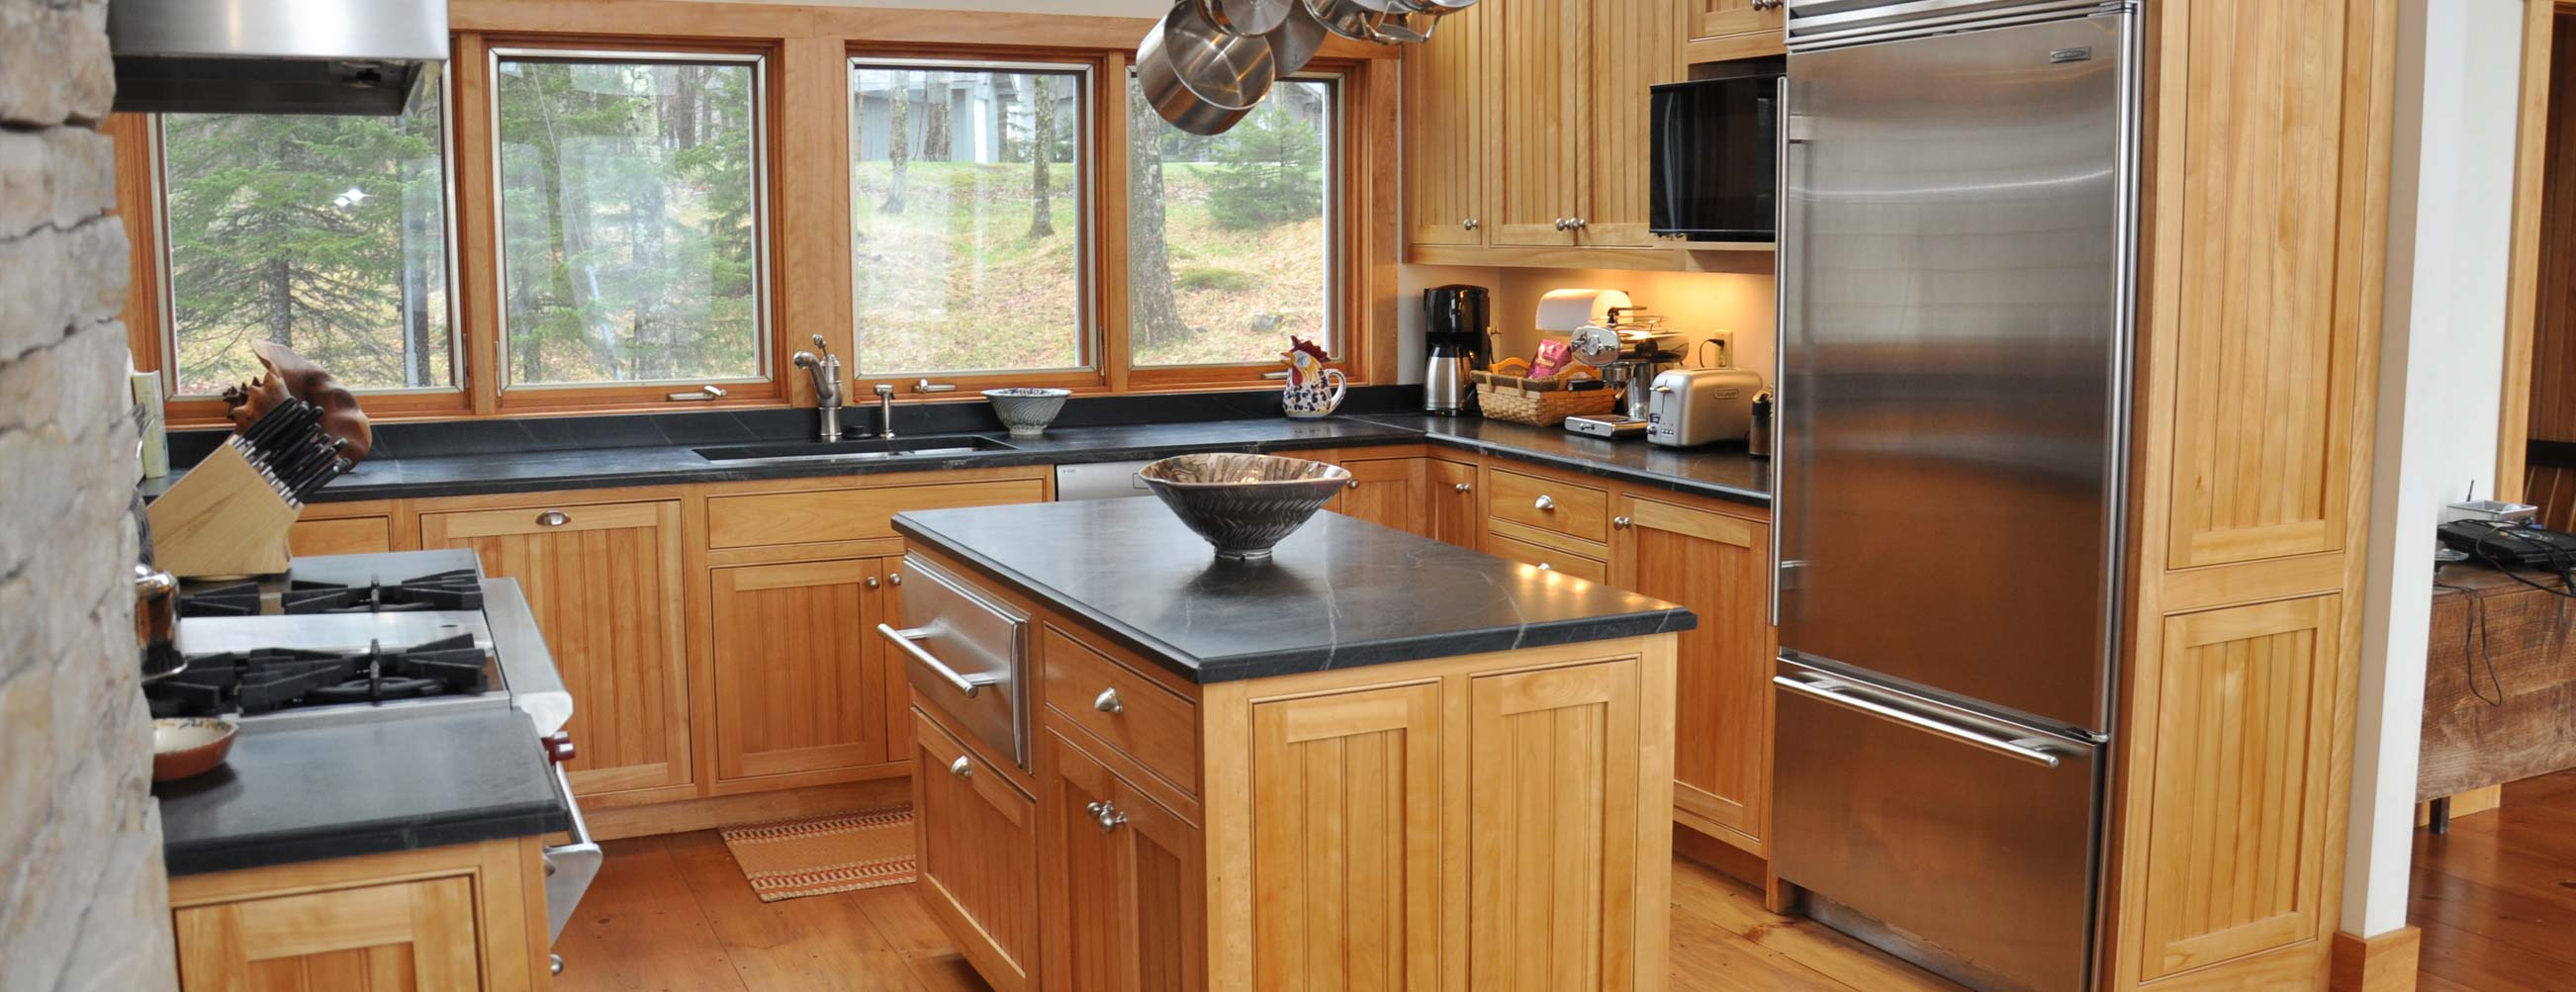 Kitchen Work Gallery | Hawk Hill Cabinetry & Custom Woodwork